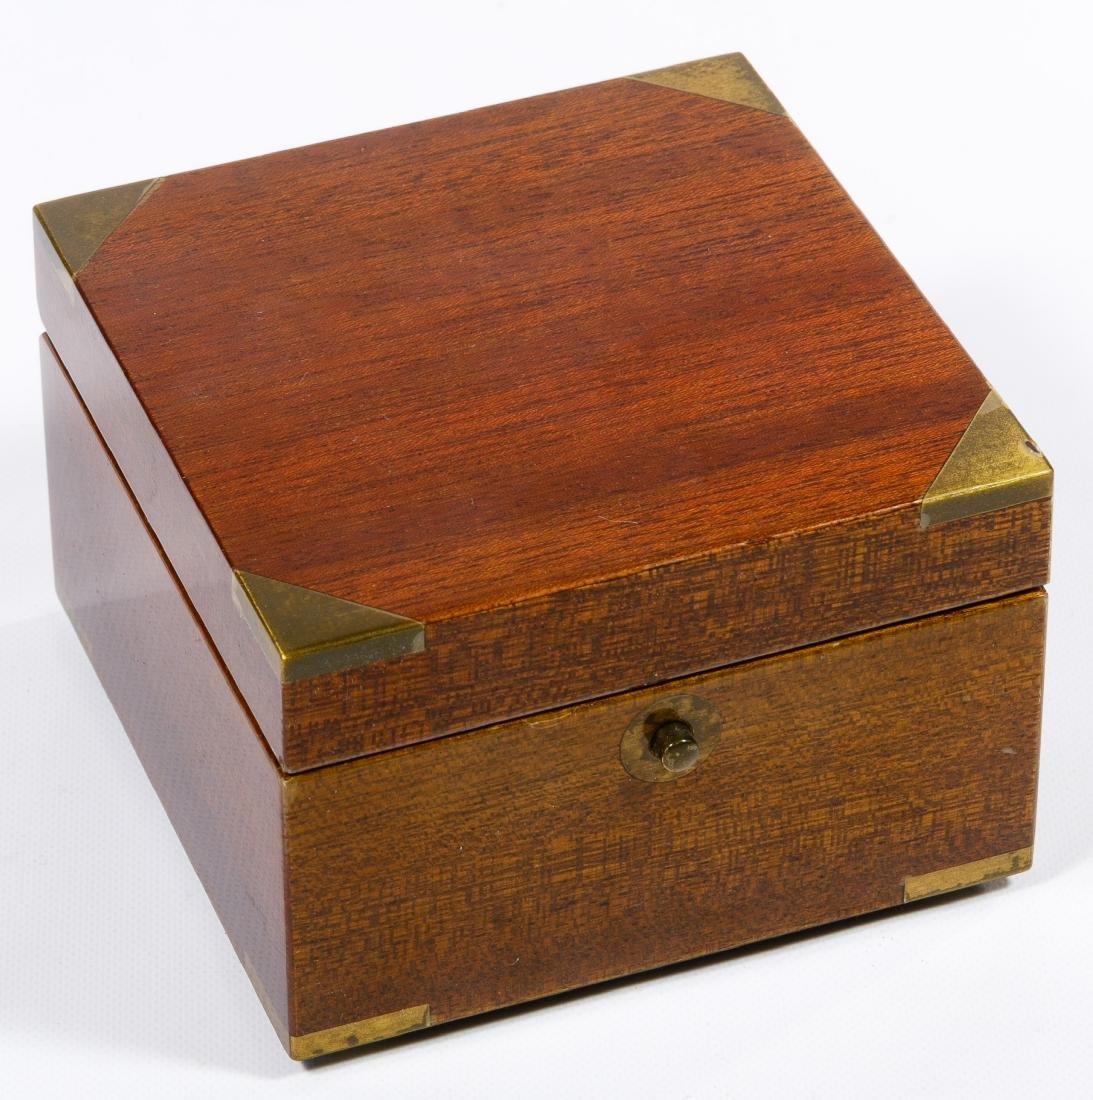 Matthew Norman Brass Desk Clock in Wood Box - 3